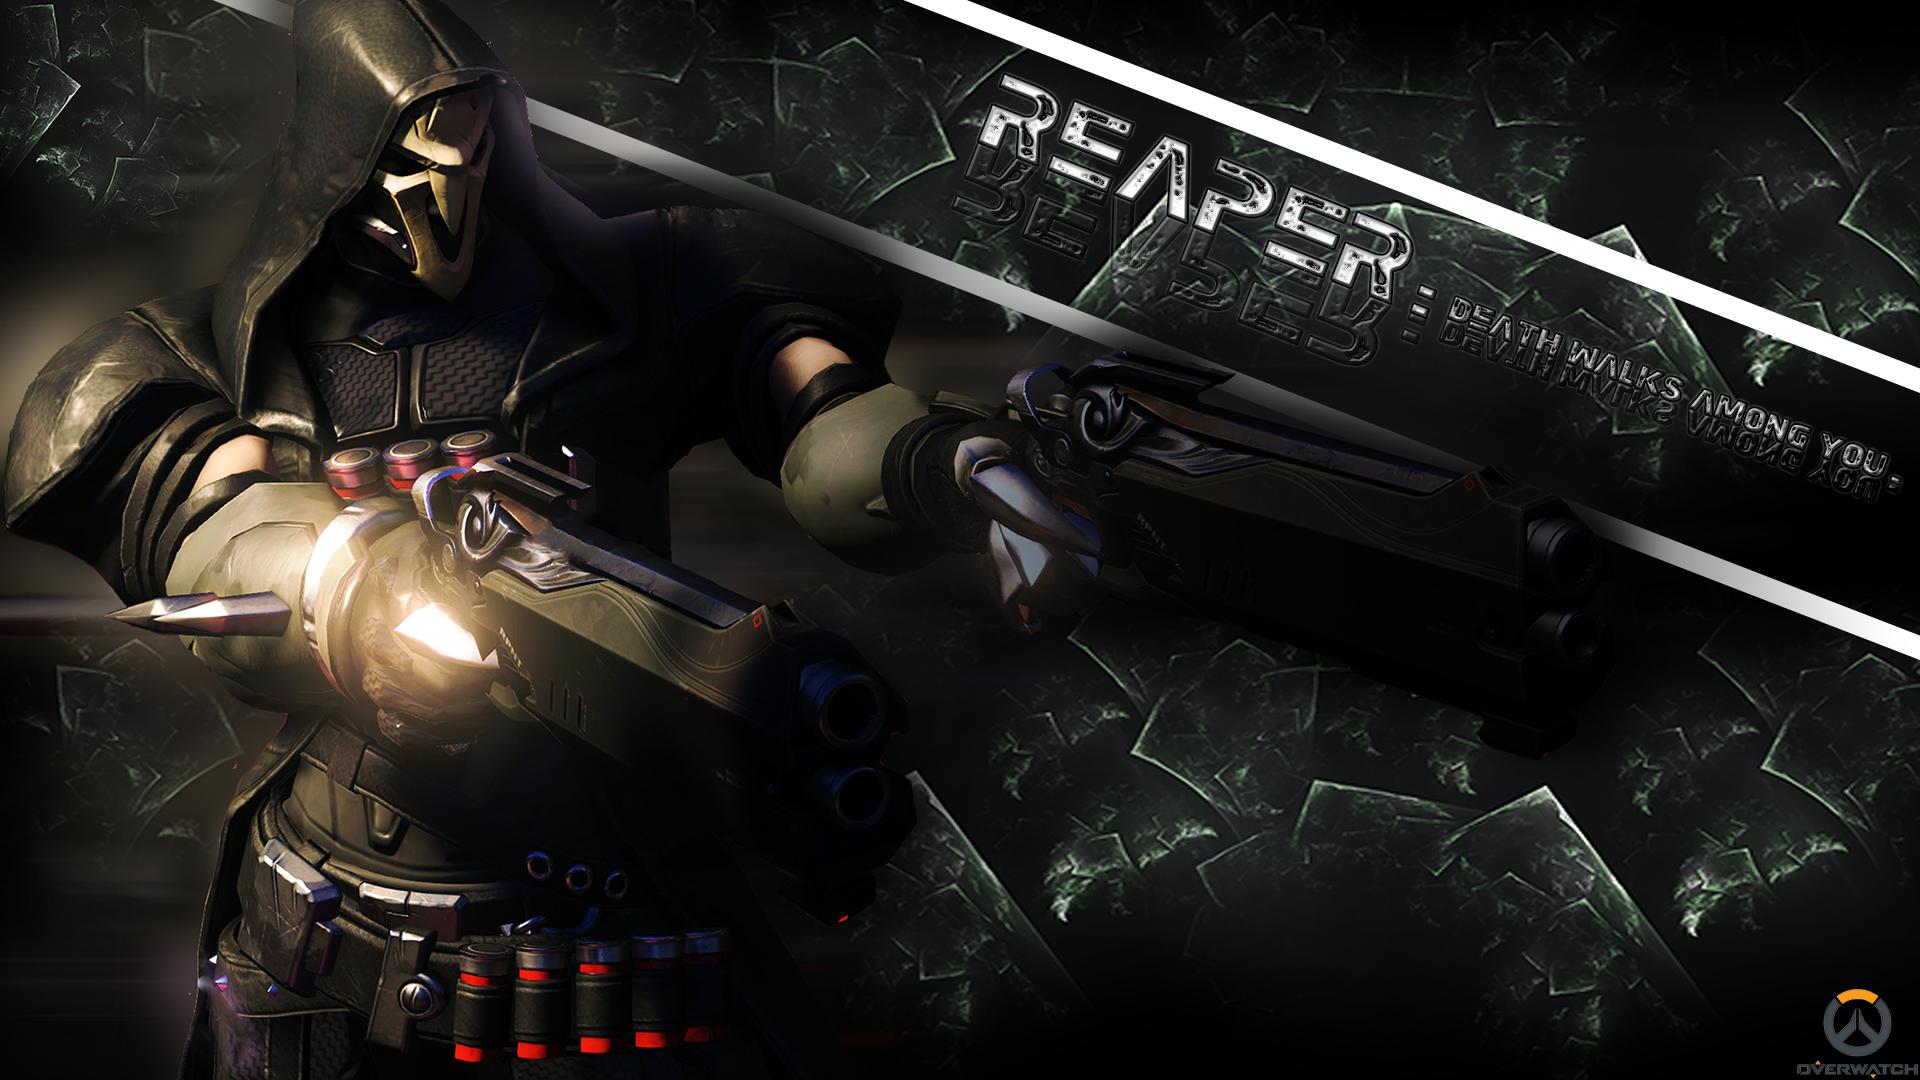 48 Overwatch Reaper Wallpaper On Wallpapersafari